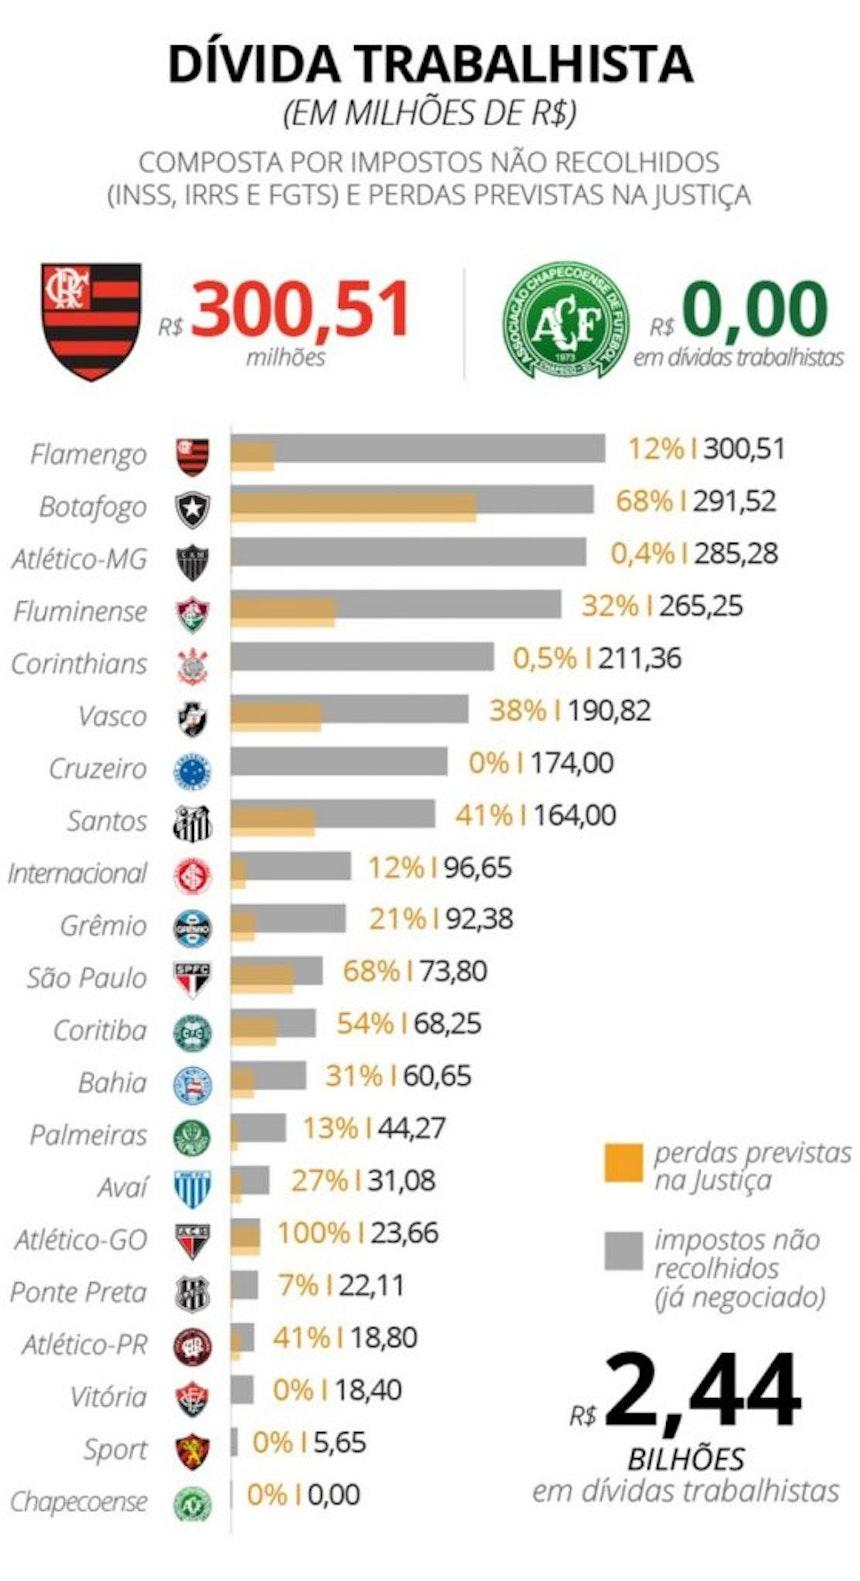 O ranking da dívida trabalhista dos clubes brasileiros (Foto: Dados obtidos nos balanços financeiros dos clubes)